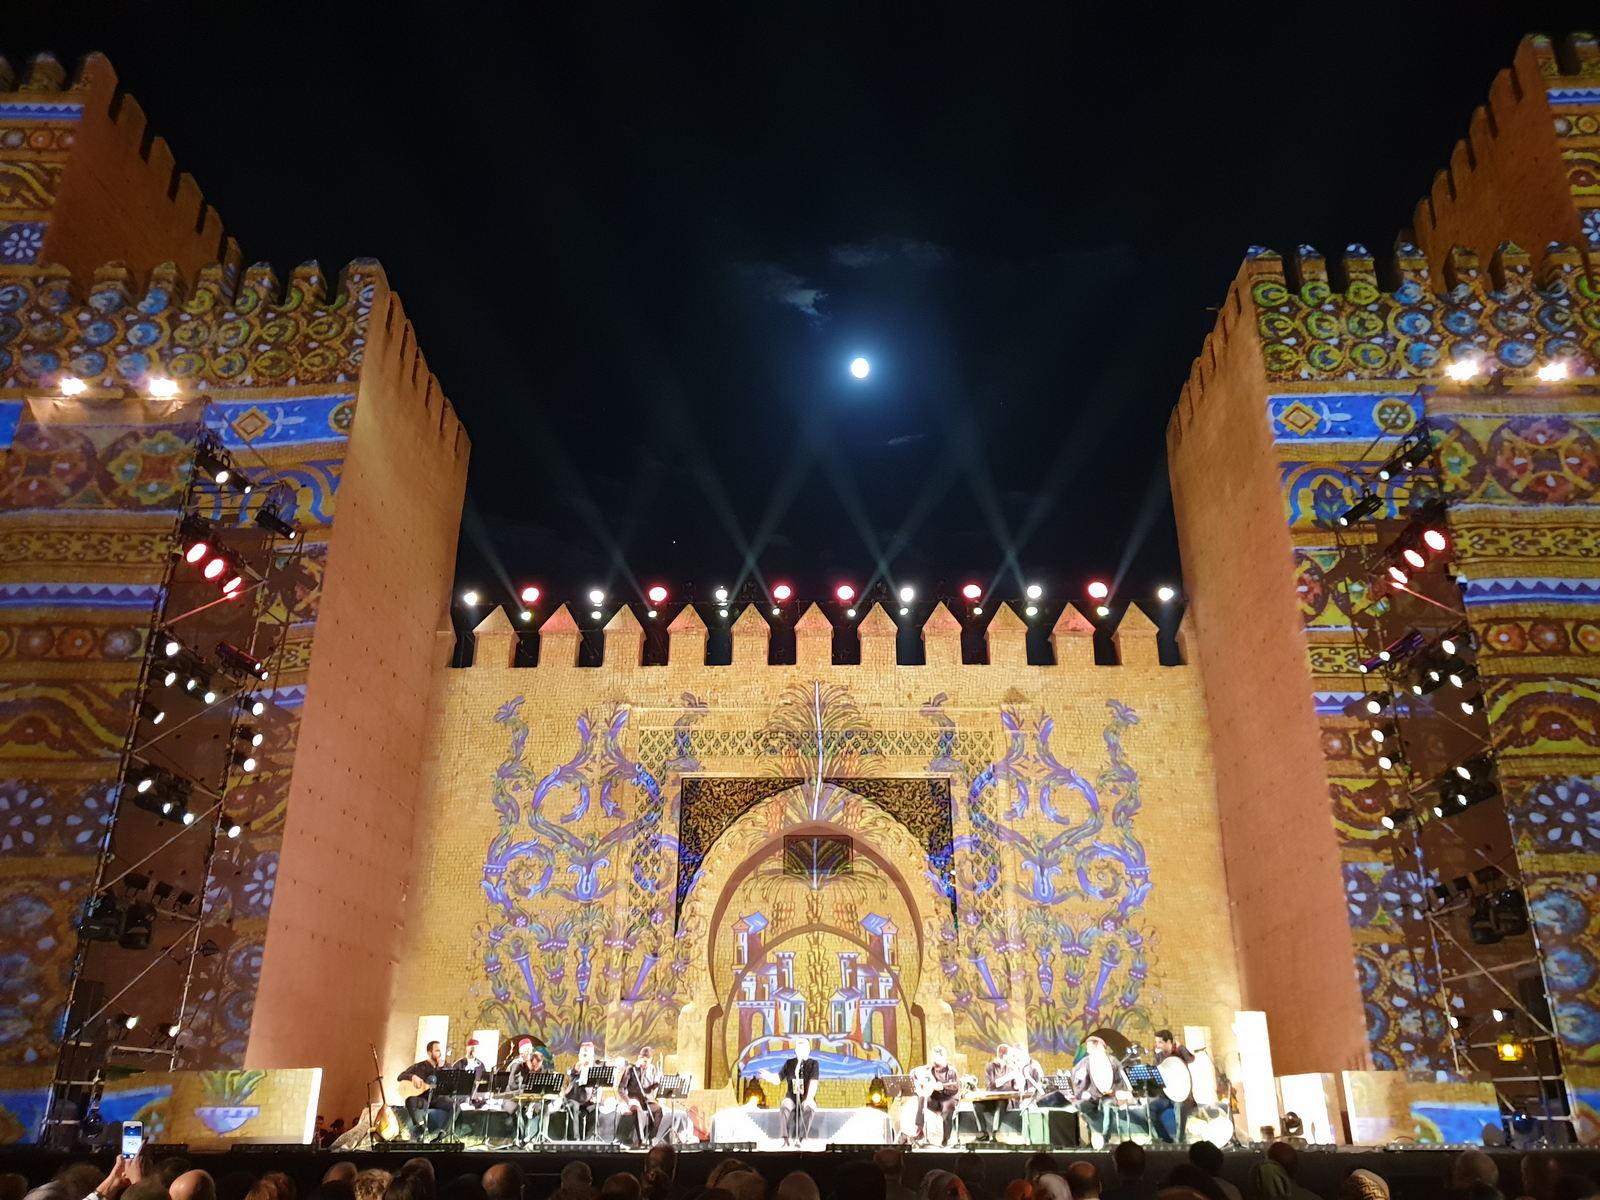 Festival de Fez de Música Sagrada • Marrocos 1